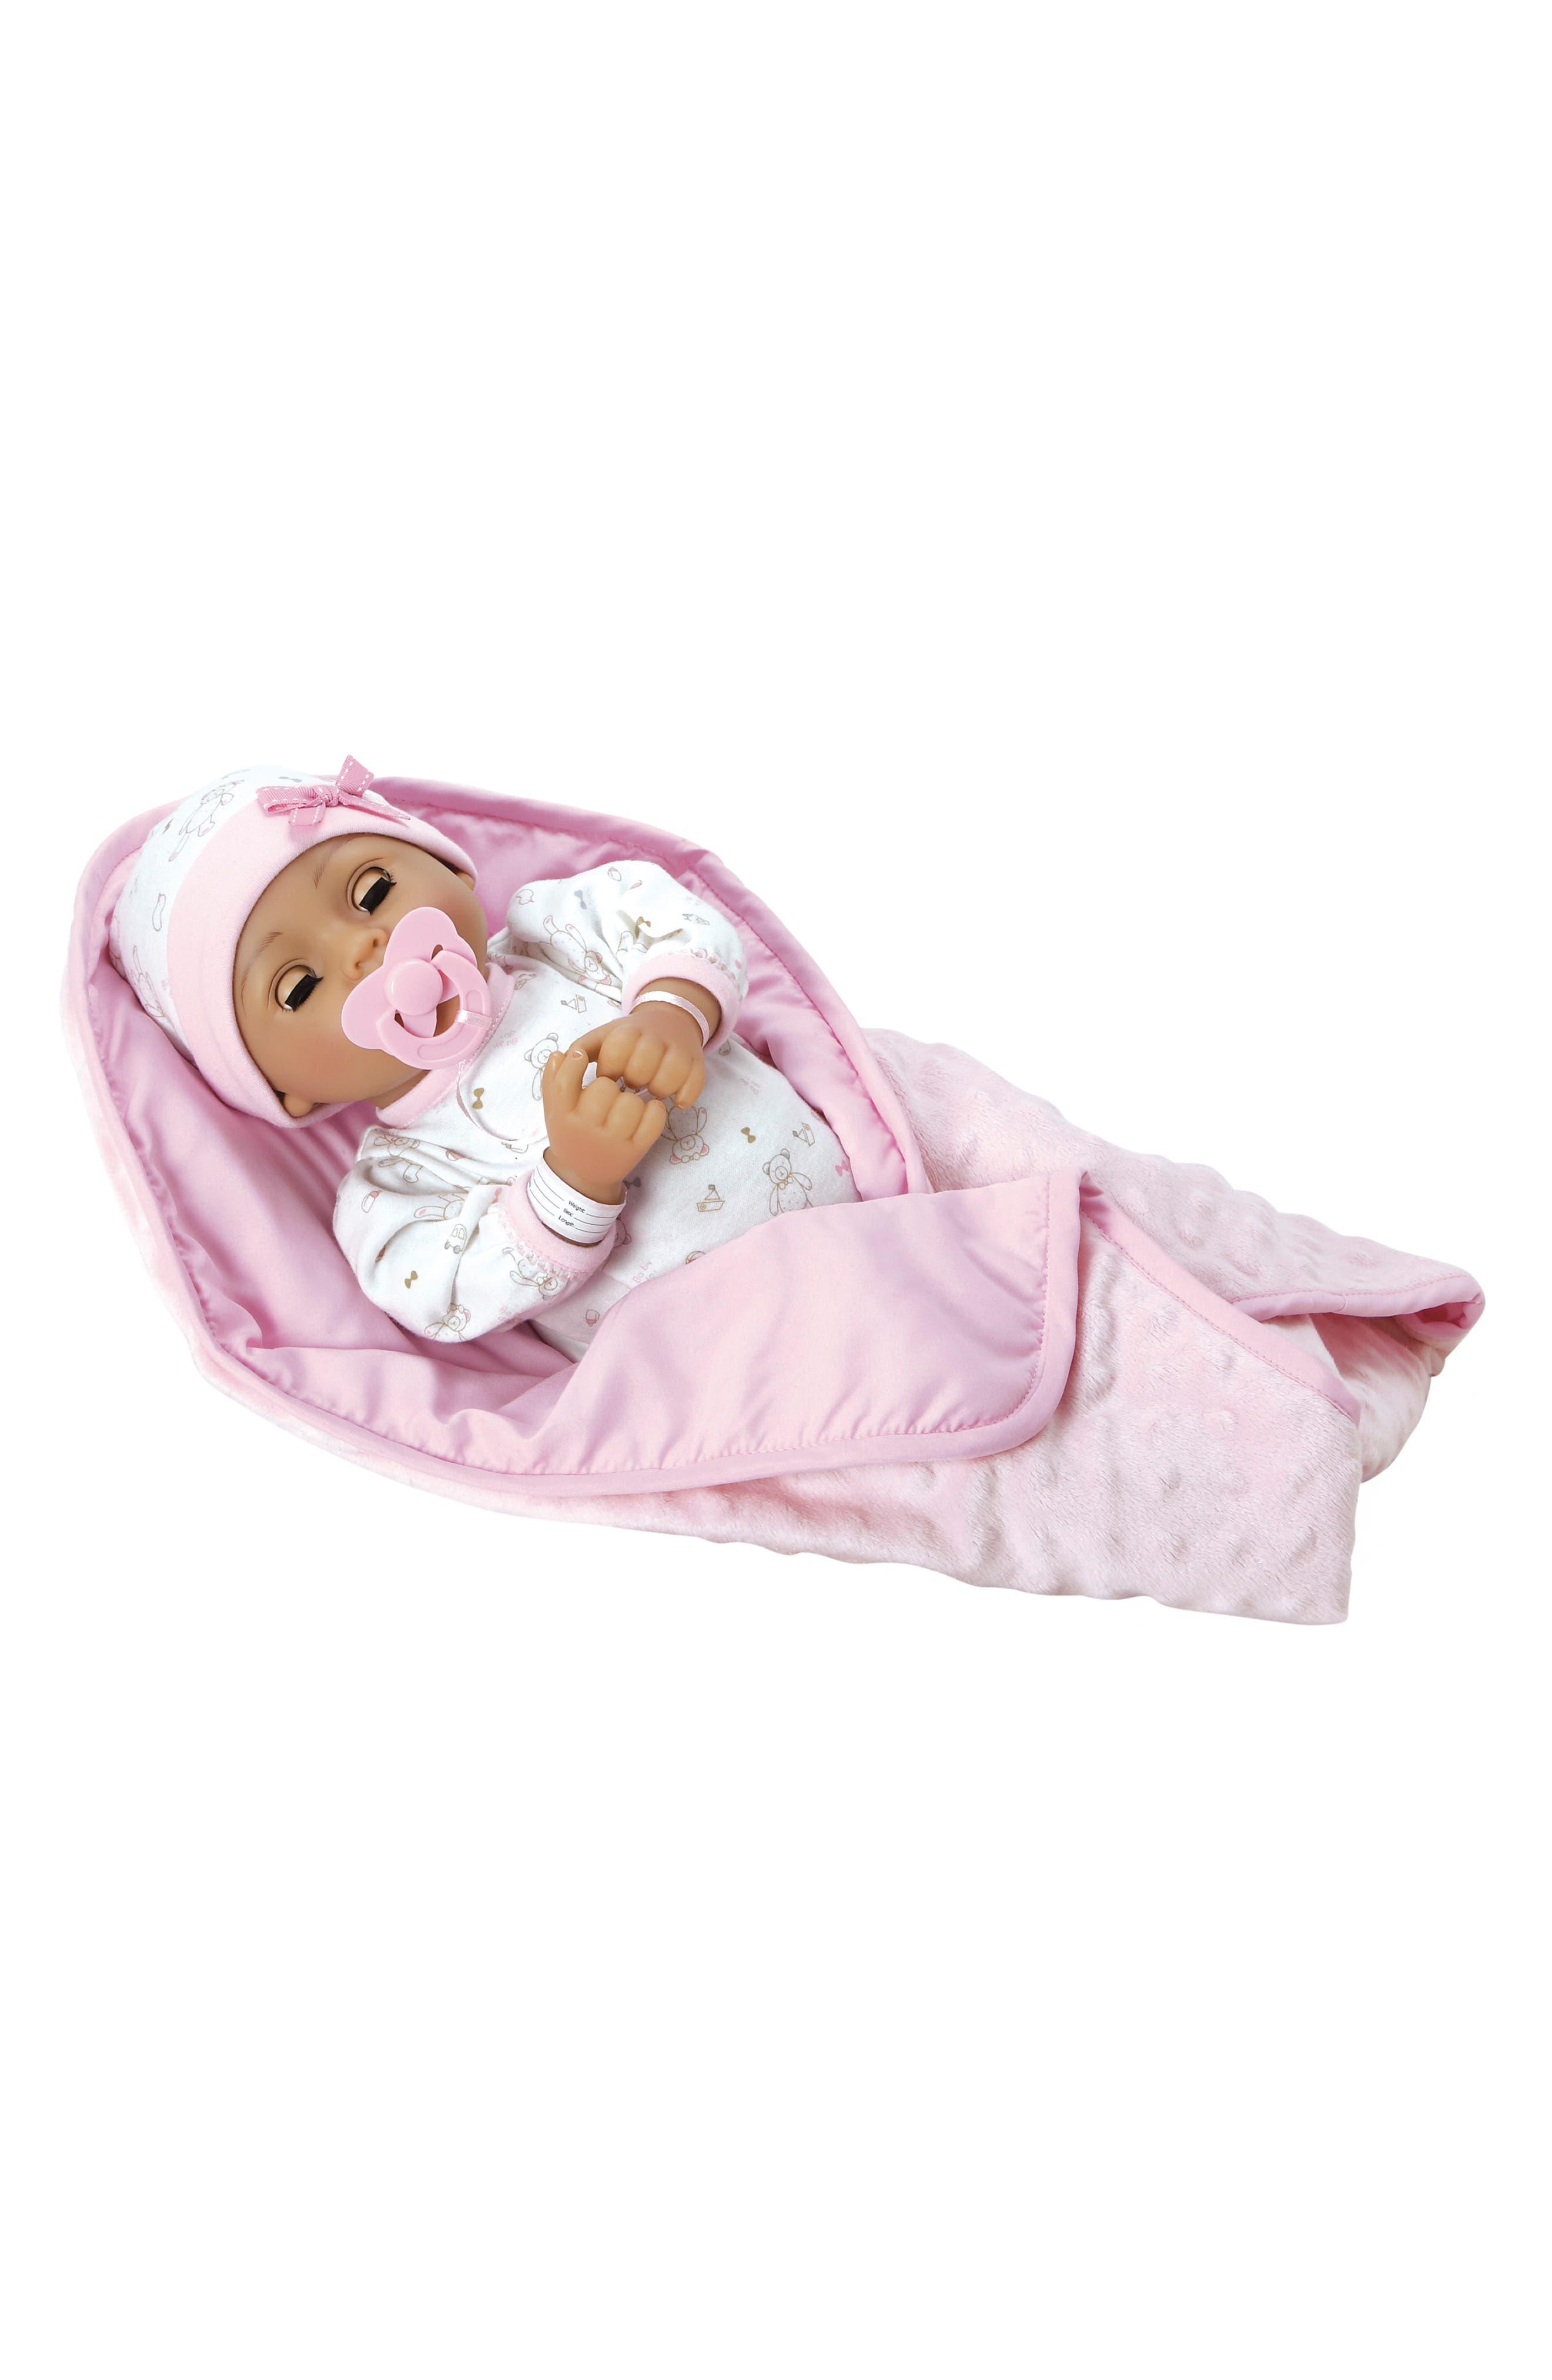 Girls Adora Precious Baby Doll With Adoption Certificate